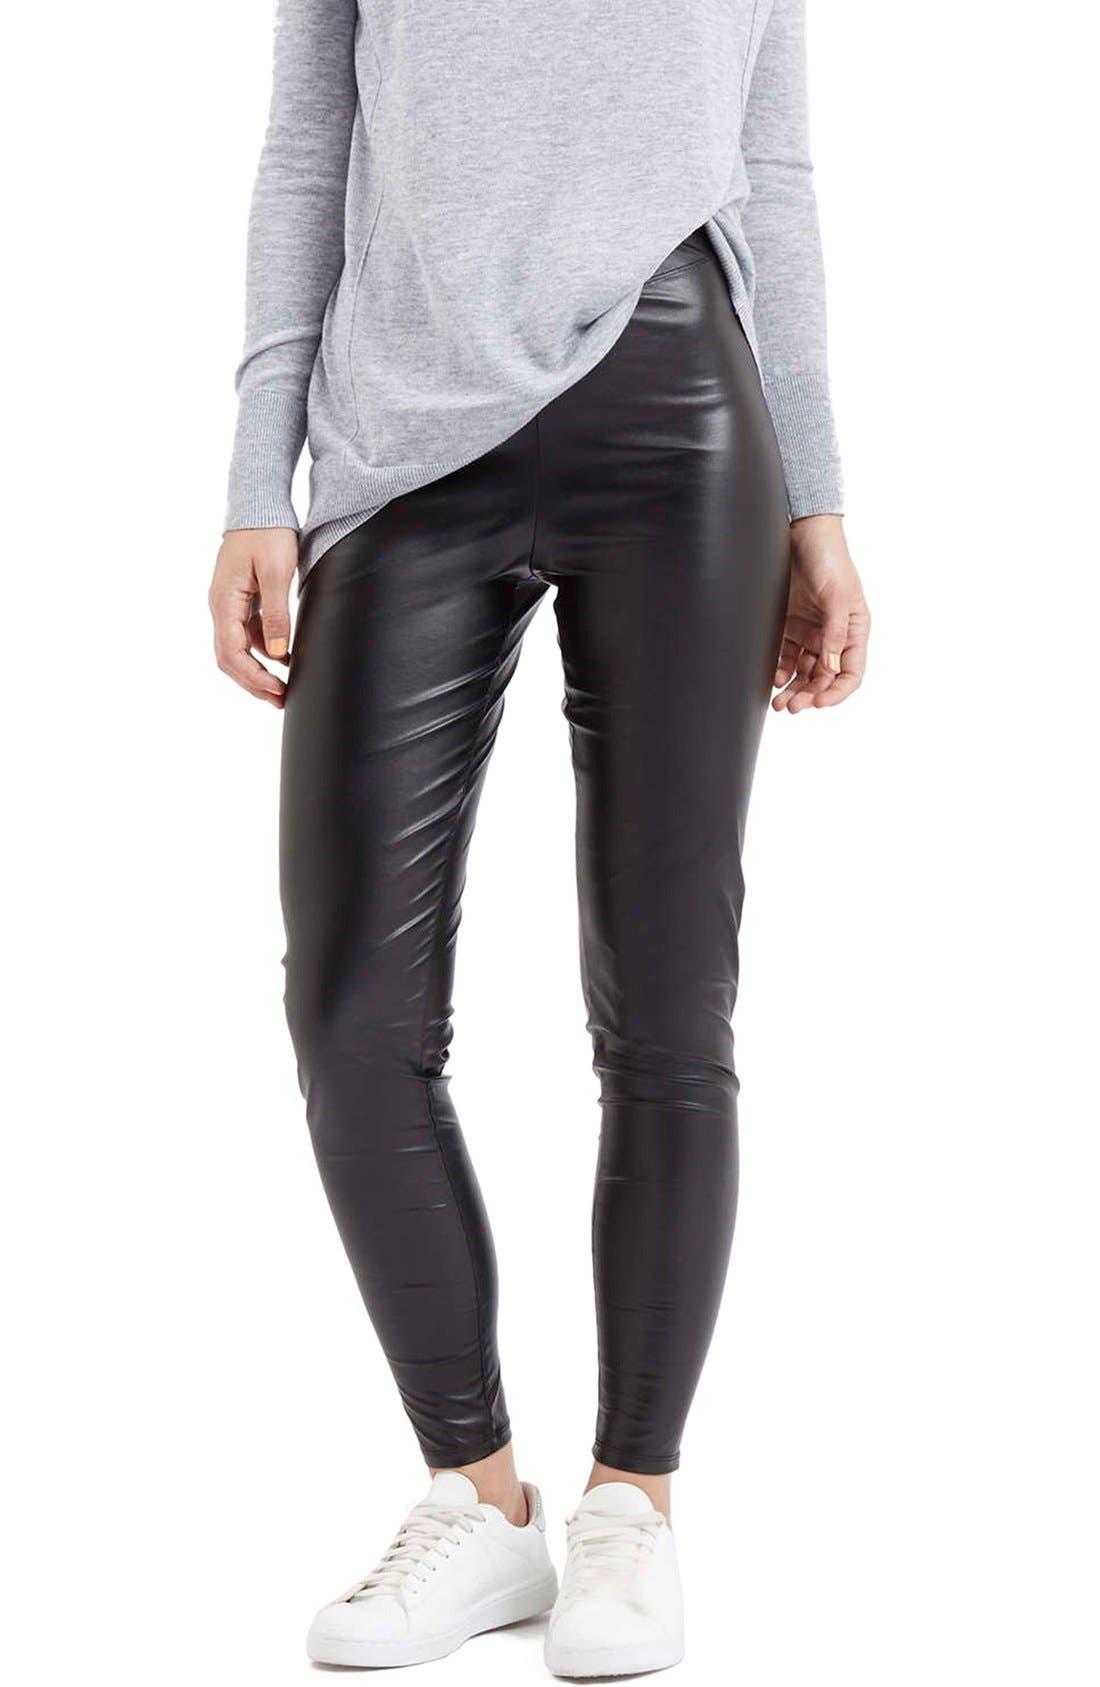 'Wet Look' Leggings,                         Main,                         color, Black